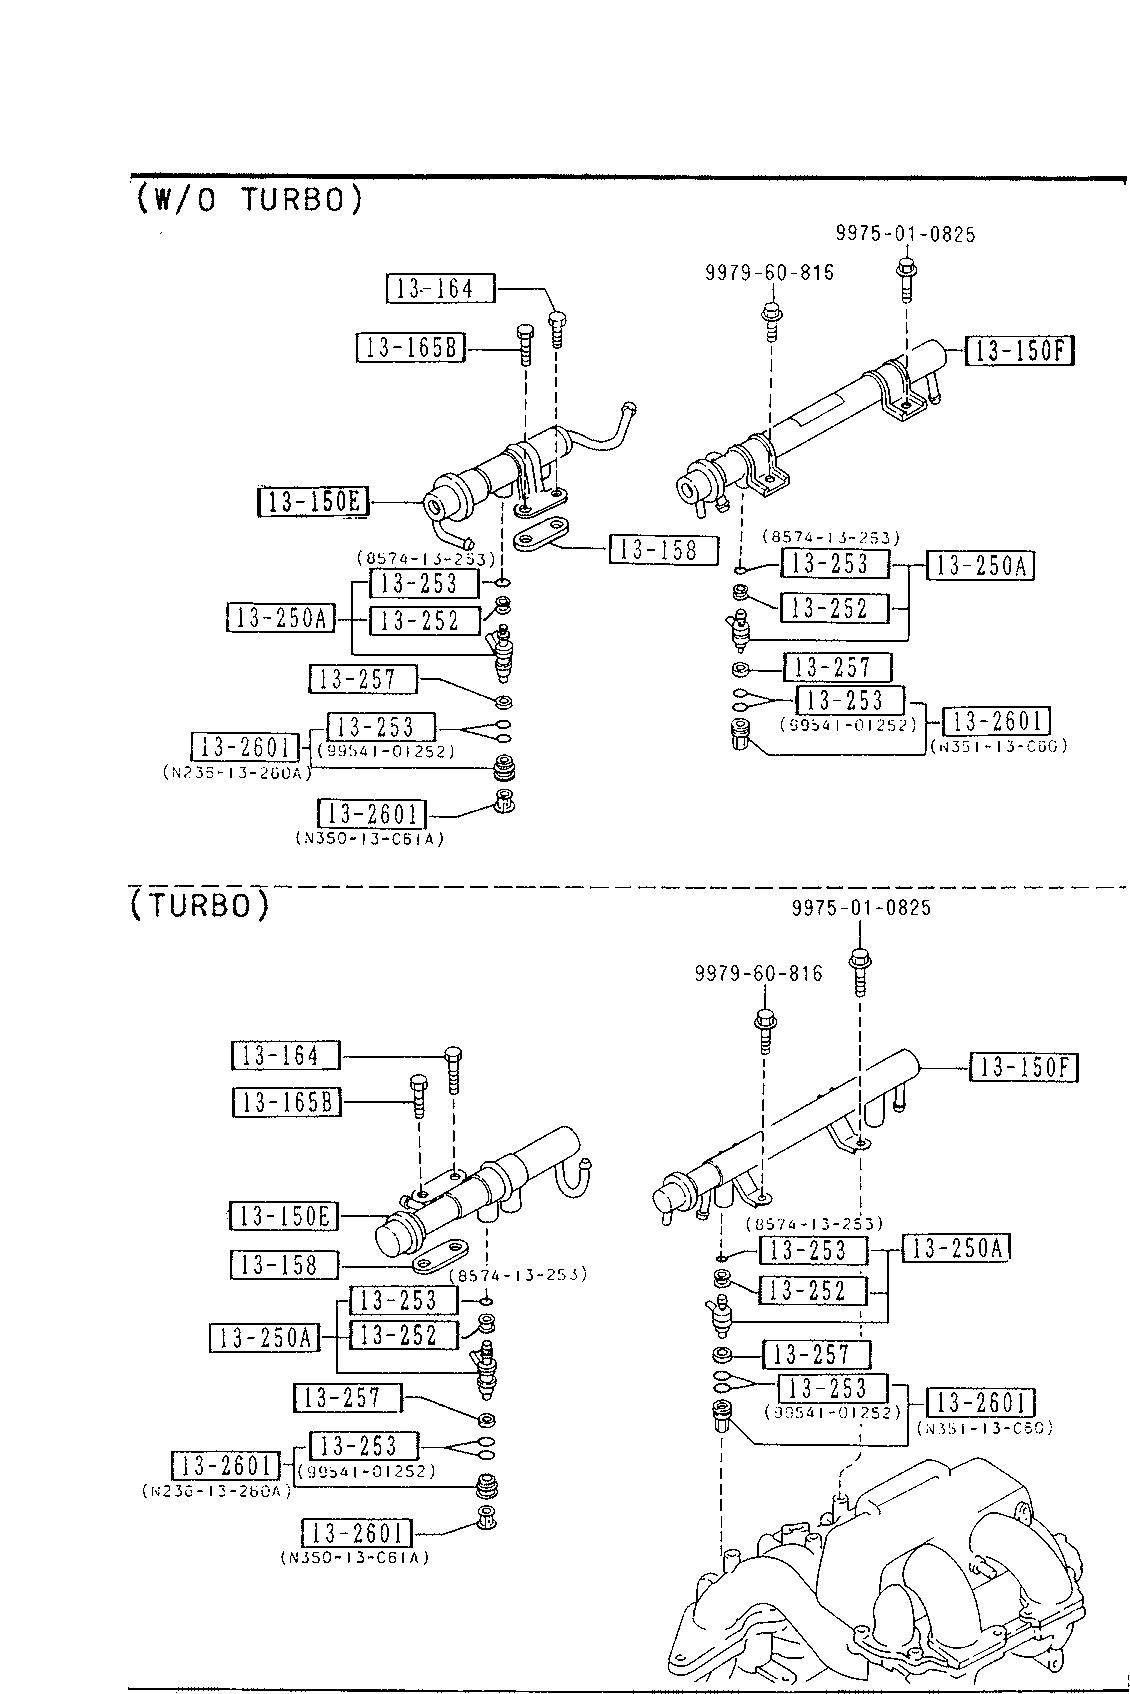 USA, 1989 RX-7, GASOLINE-ENGINE SUPPLEMENT, 1325 - FUEL DISTRIBUTOR